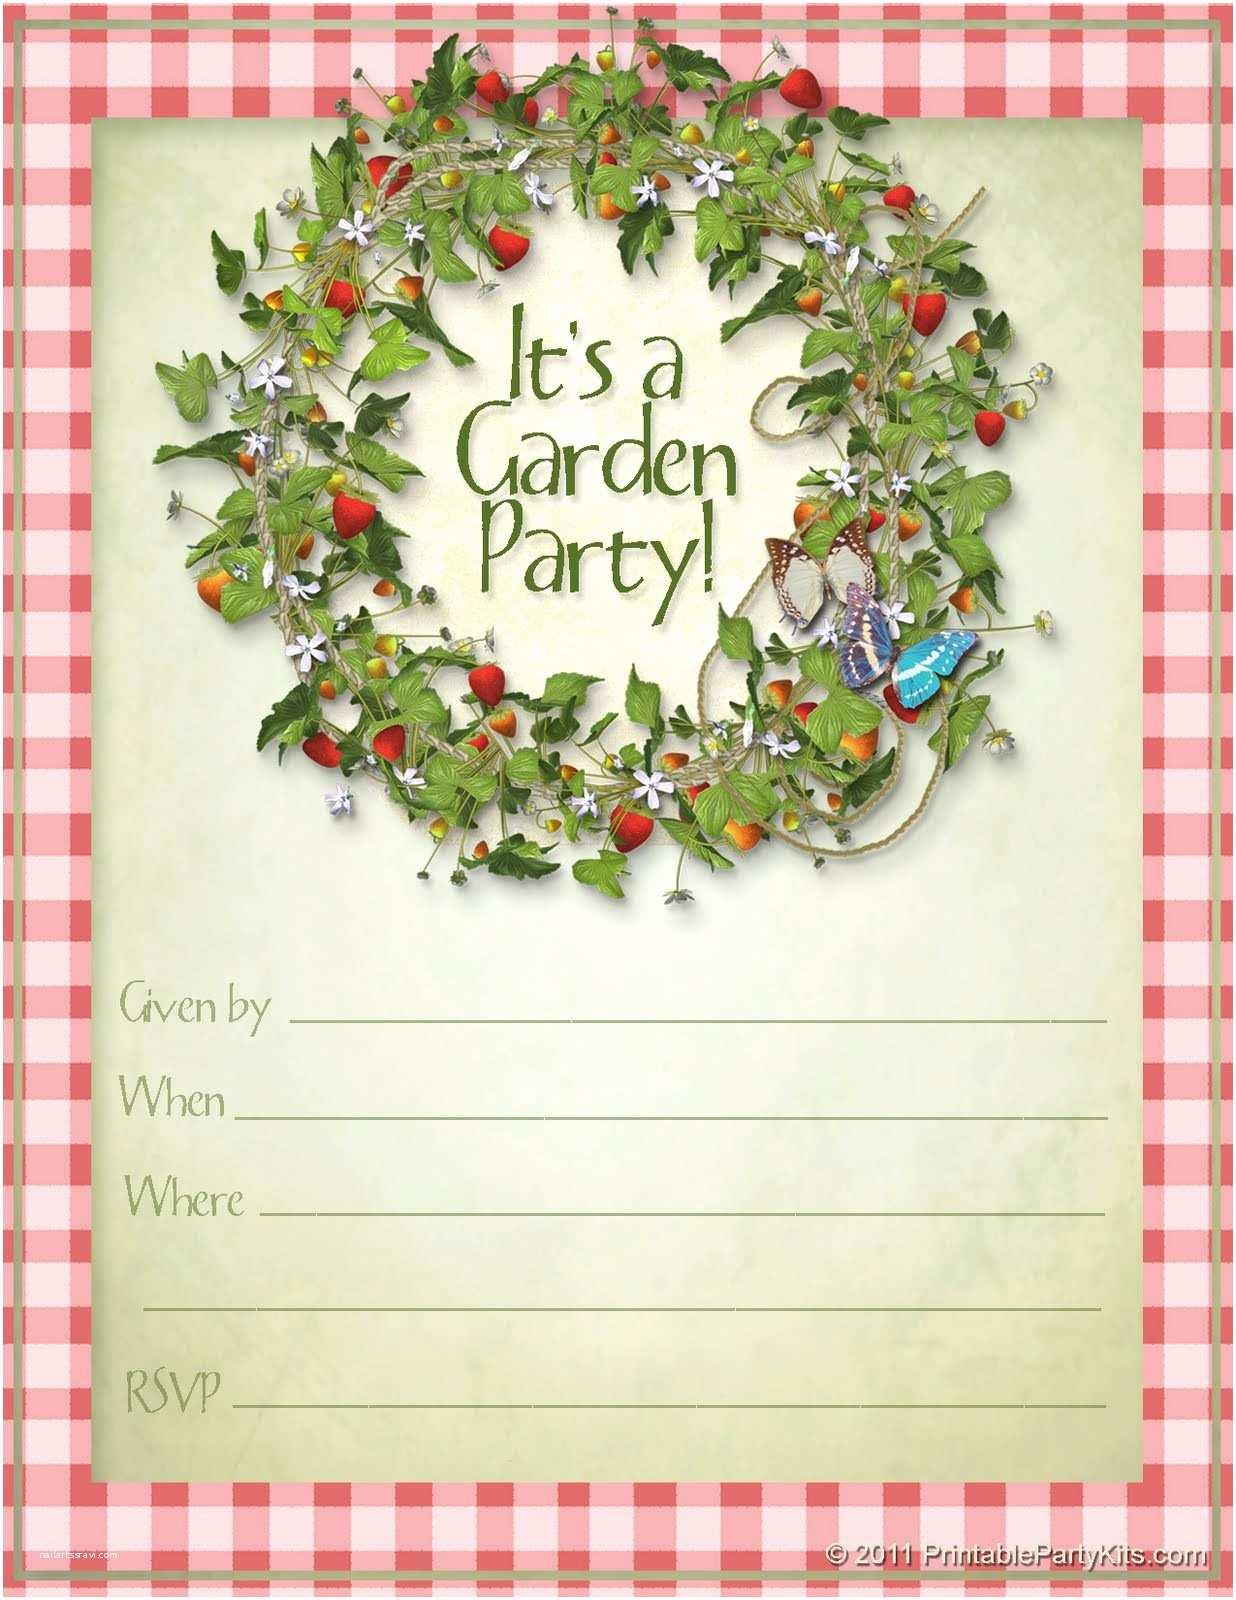 Birthday Invitation Template Card Template Summer Party Invitation Template Card